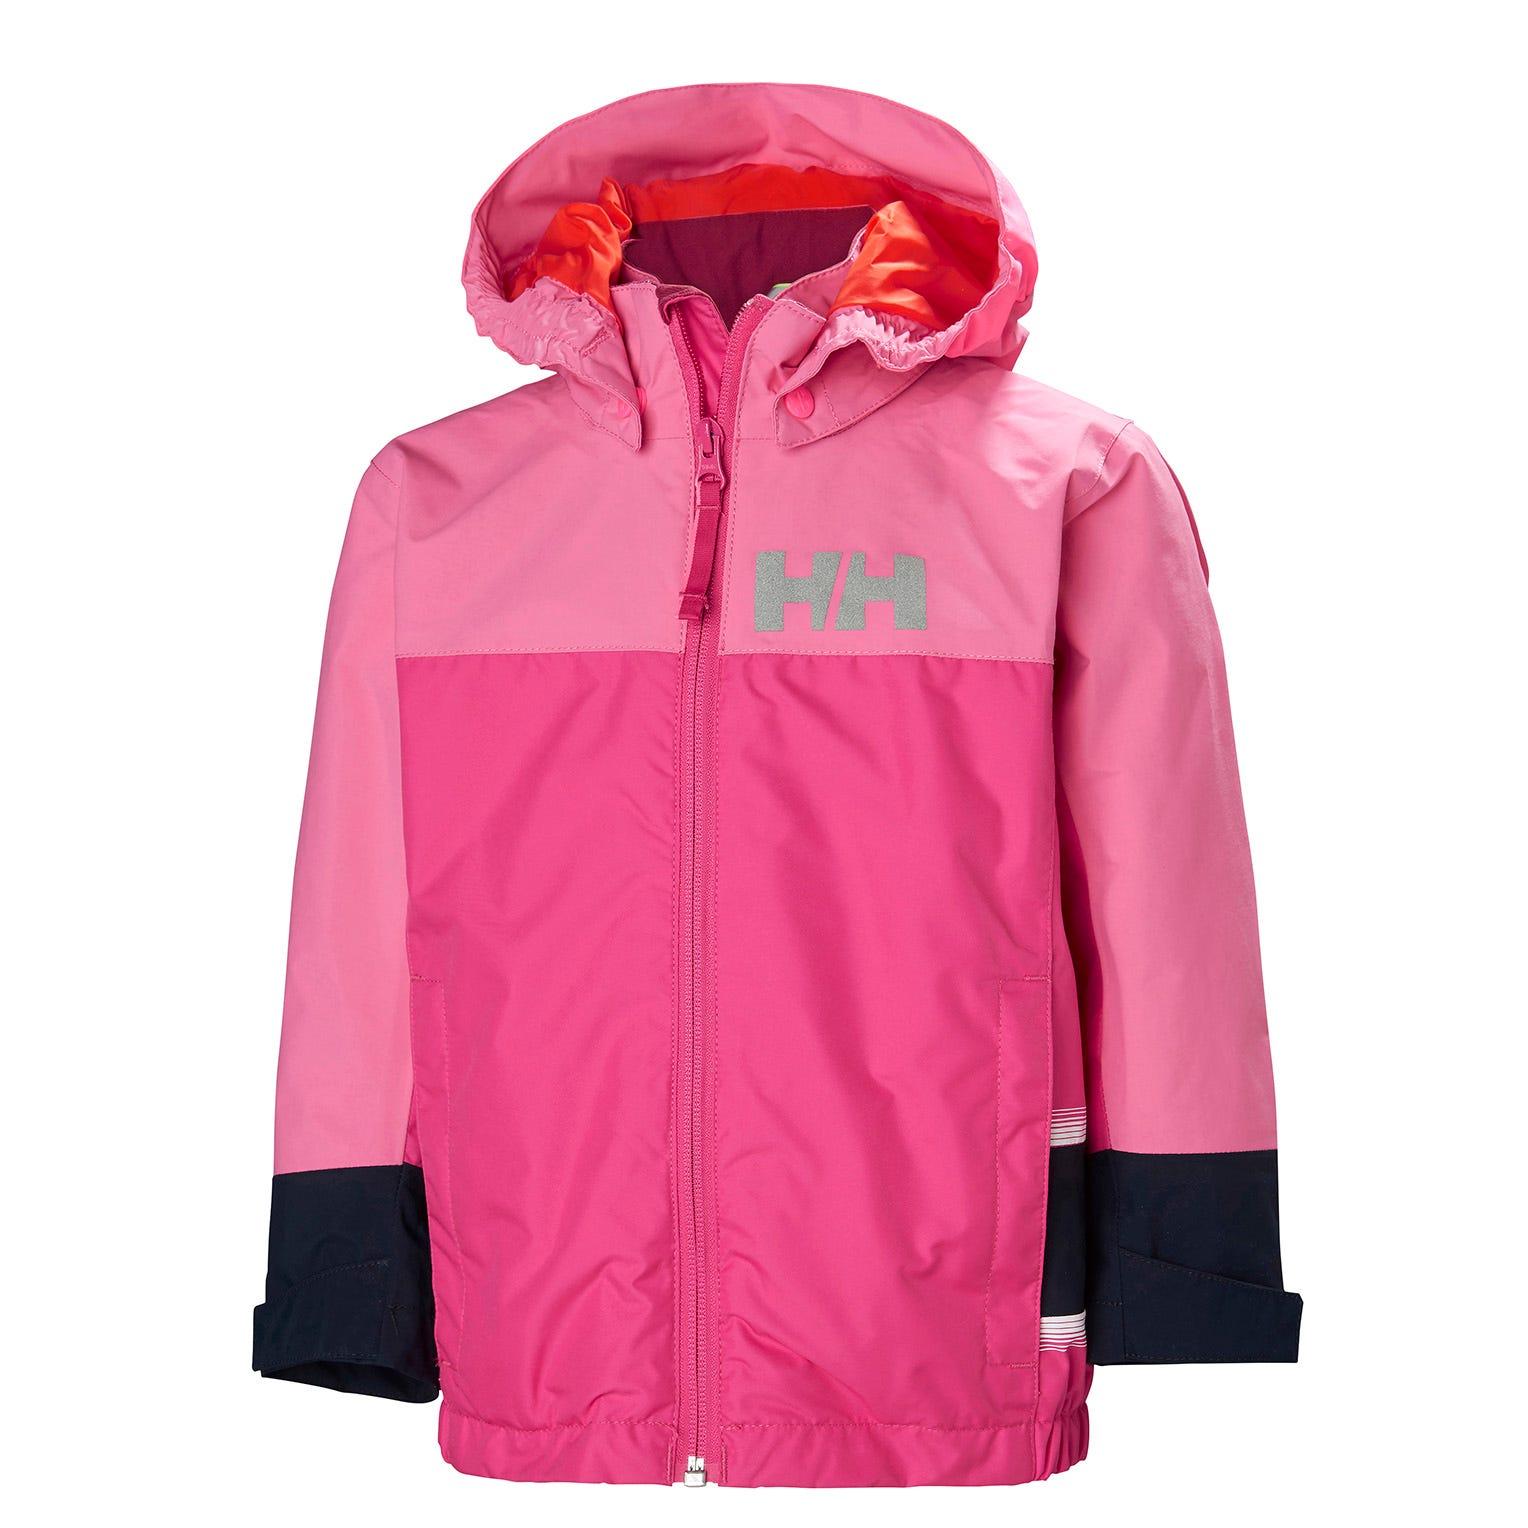 Helly Hansen Kids Norse Jacket Parka Pink 92/2